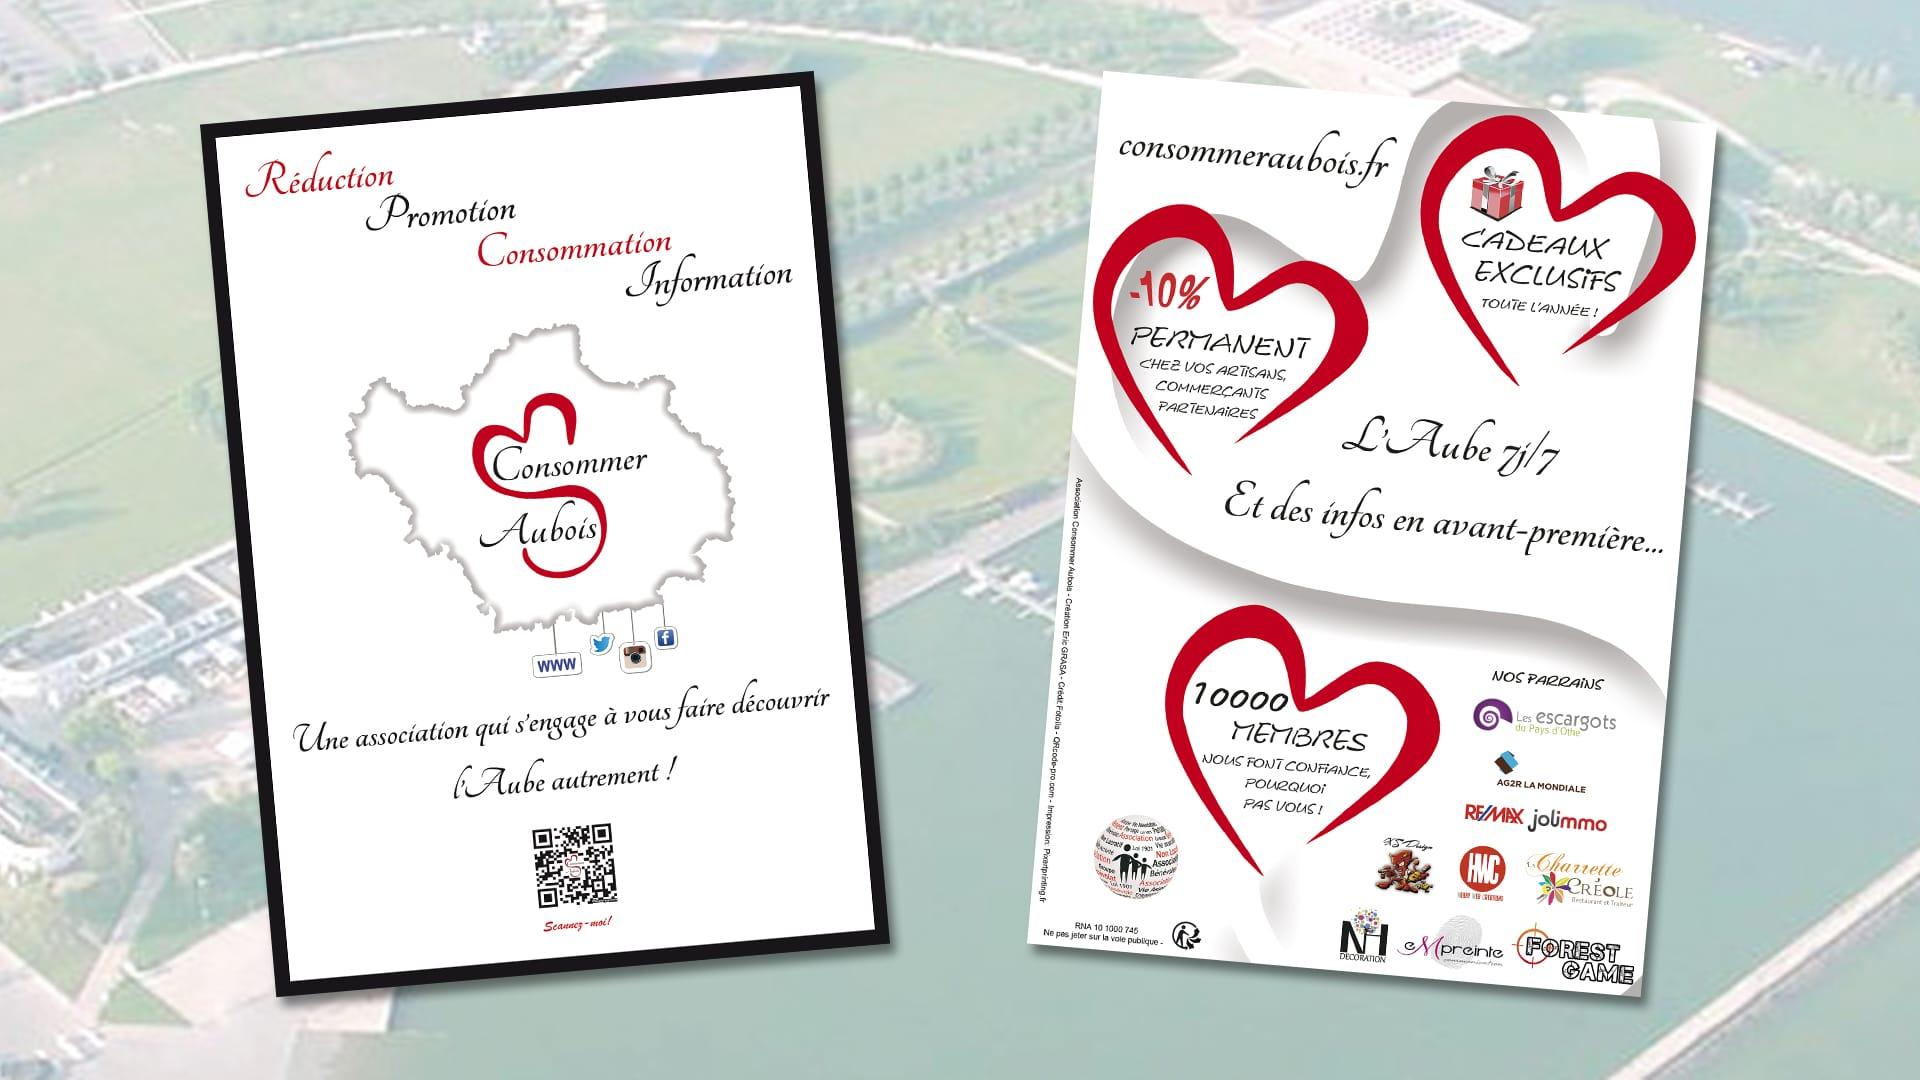 Présentation Flyer Consommer Aubois